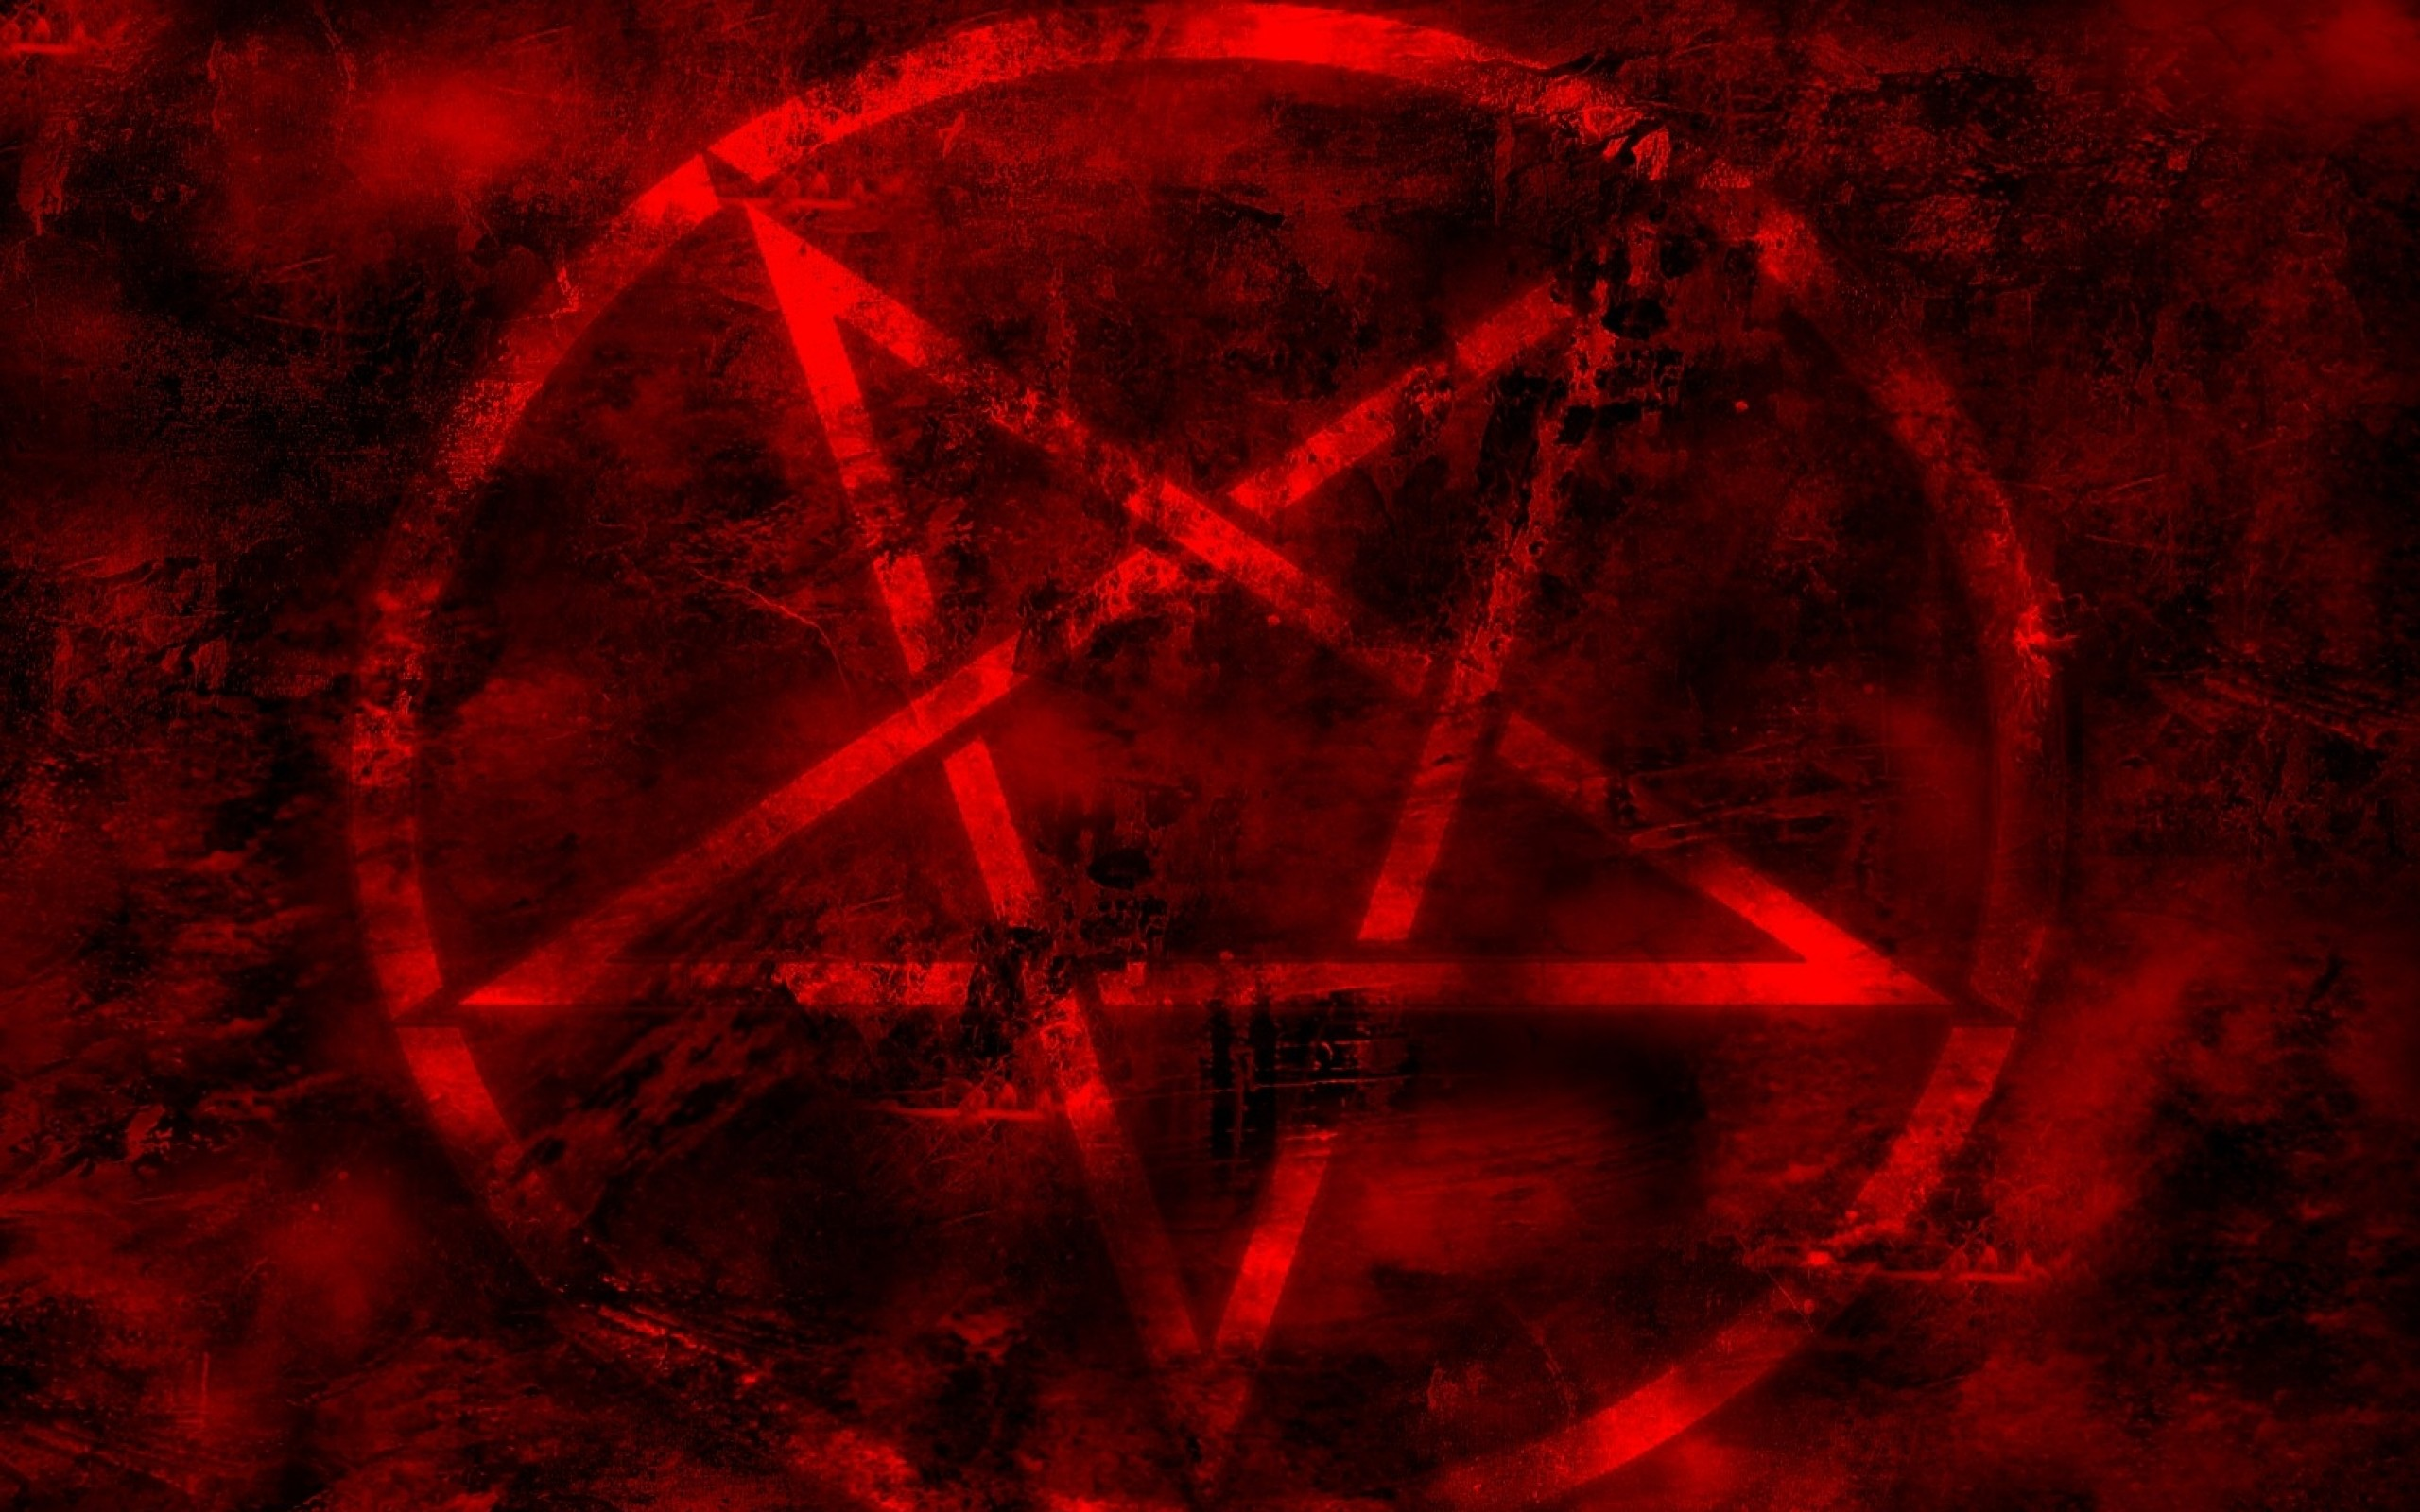 символы ада картинки только